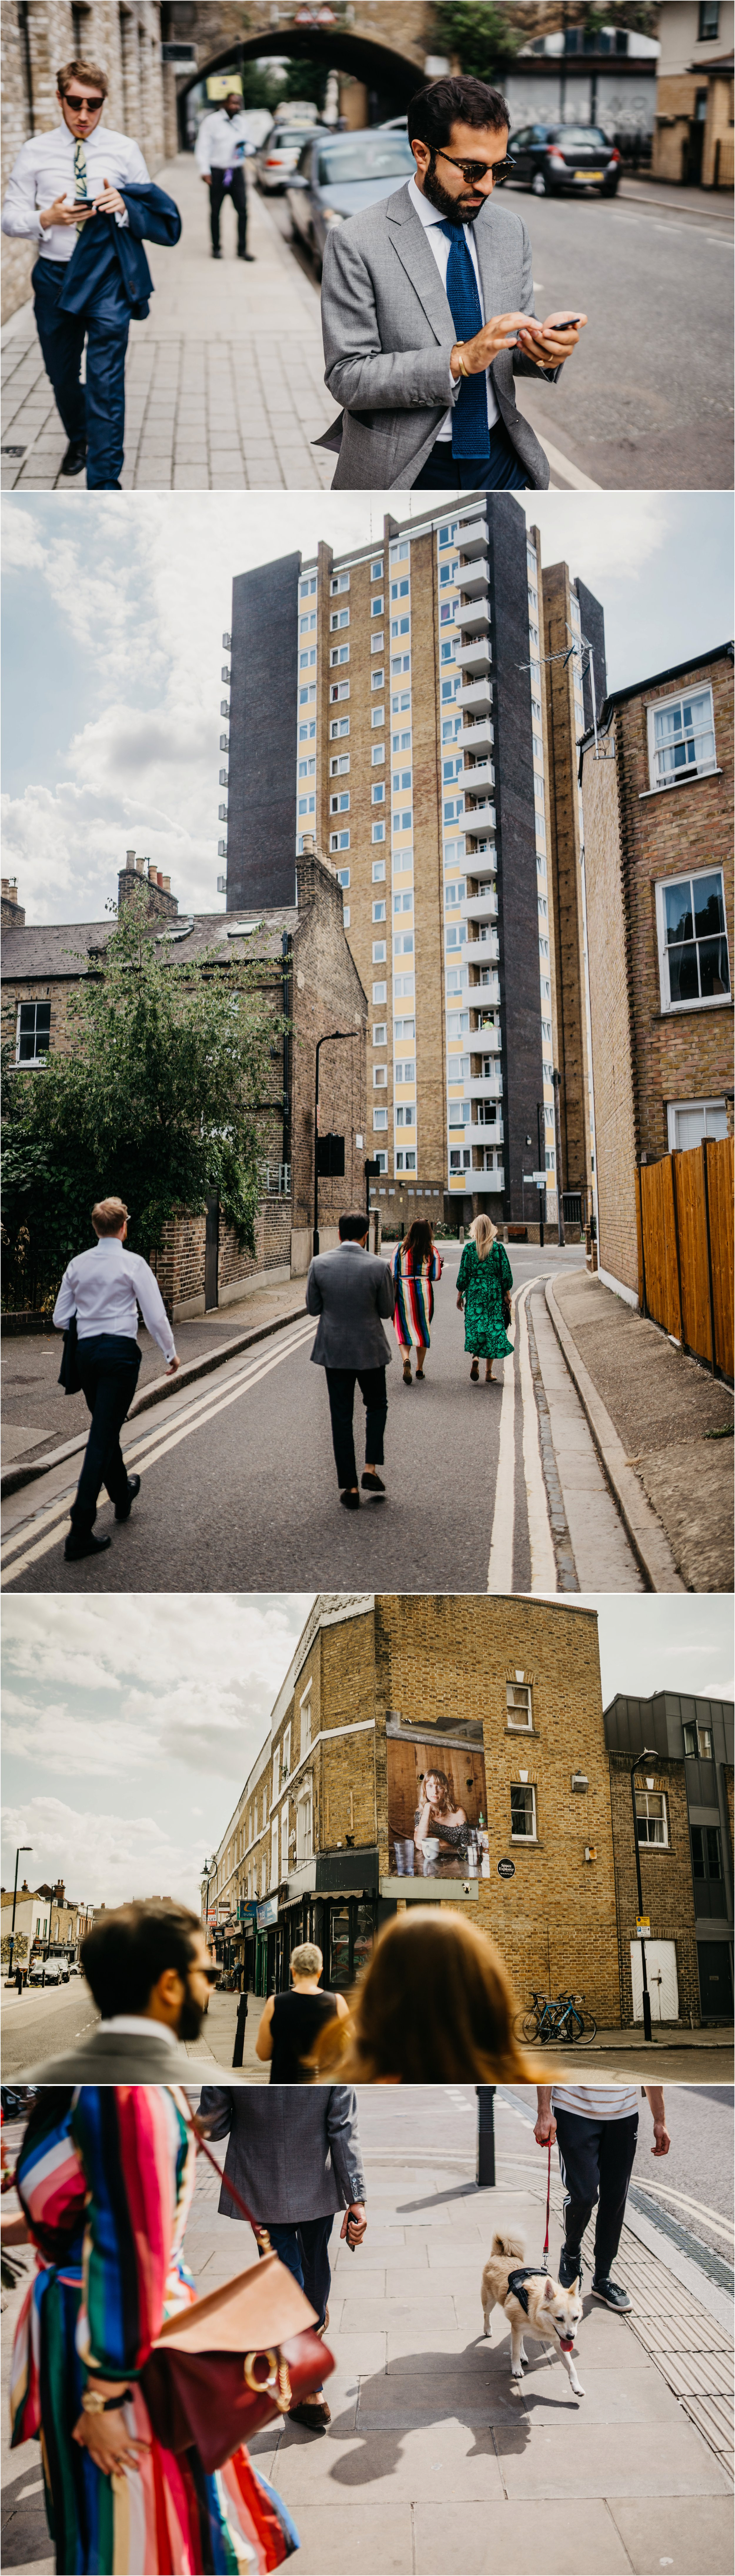 Hackney Town Hall London wedding photographer_0022.jpg